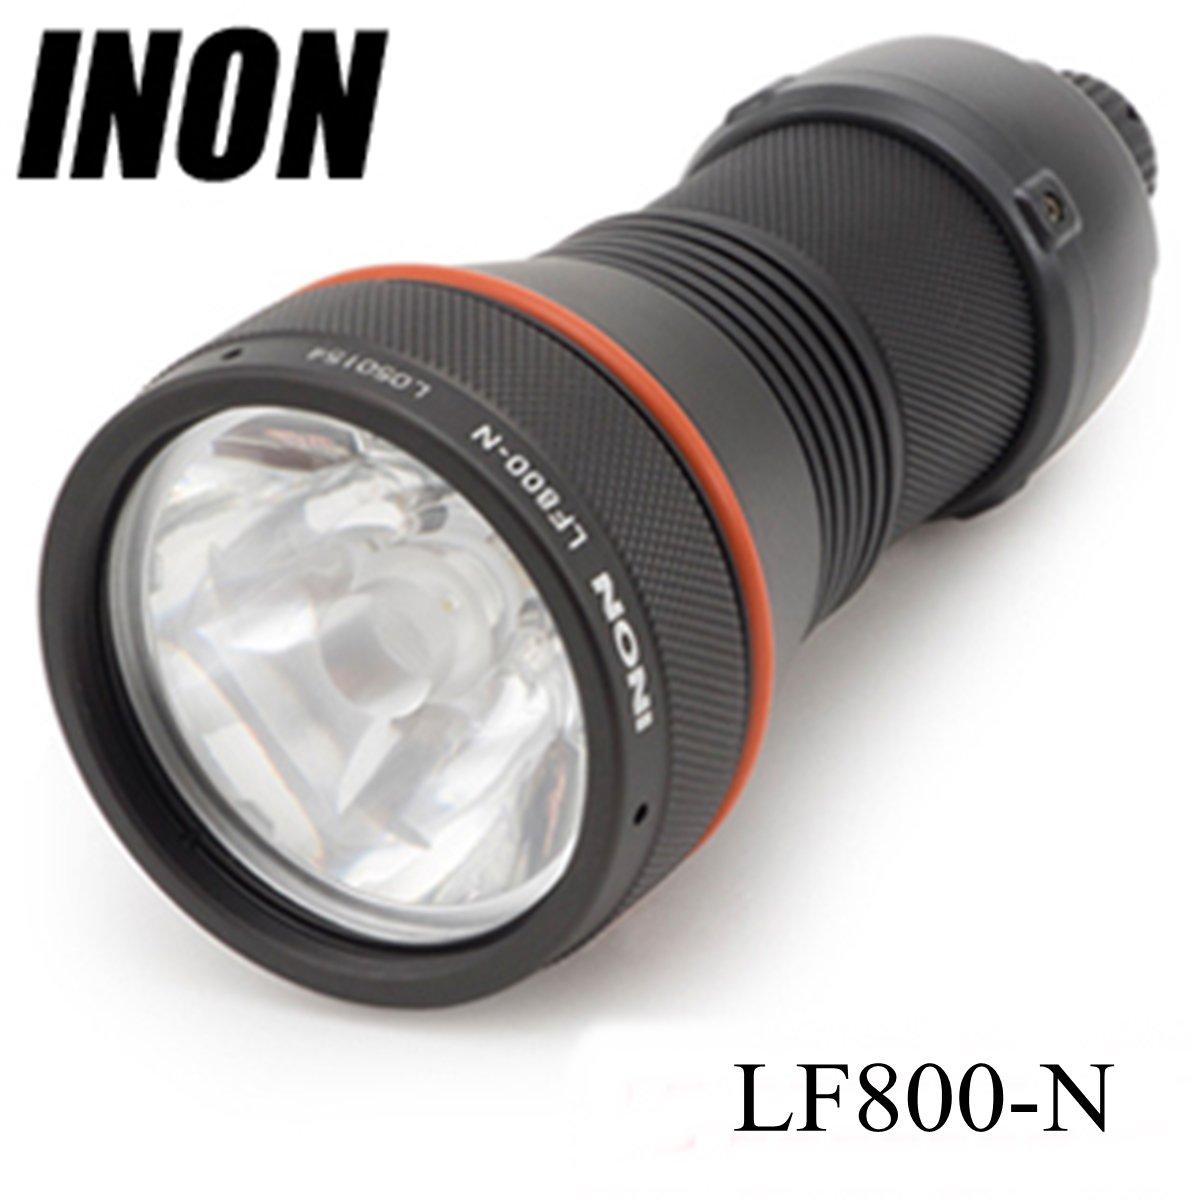 【60%OFF】 INON(イノン) LF800-N B00RBNFC5W LF800-N LEDライト INON(イノン) LEDライト B00RBNFC5W, 羽毛布団再生工房だんだん:d64dcc01 --- pizzaovens4u.com